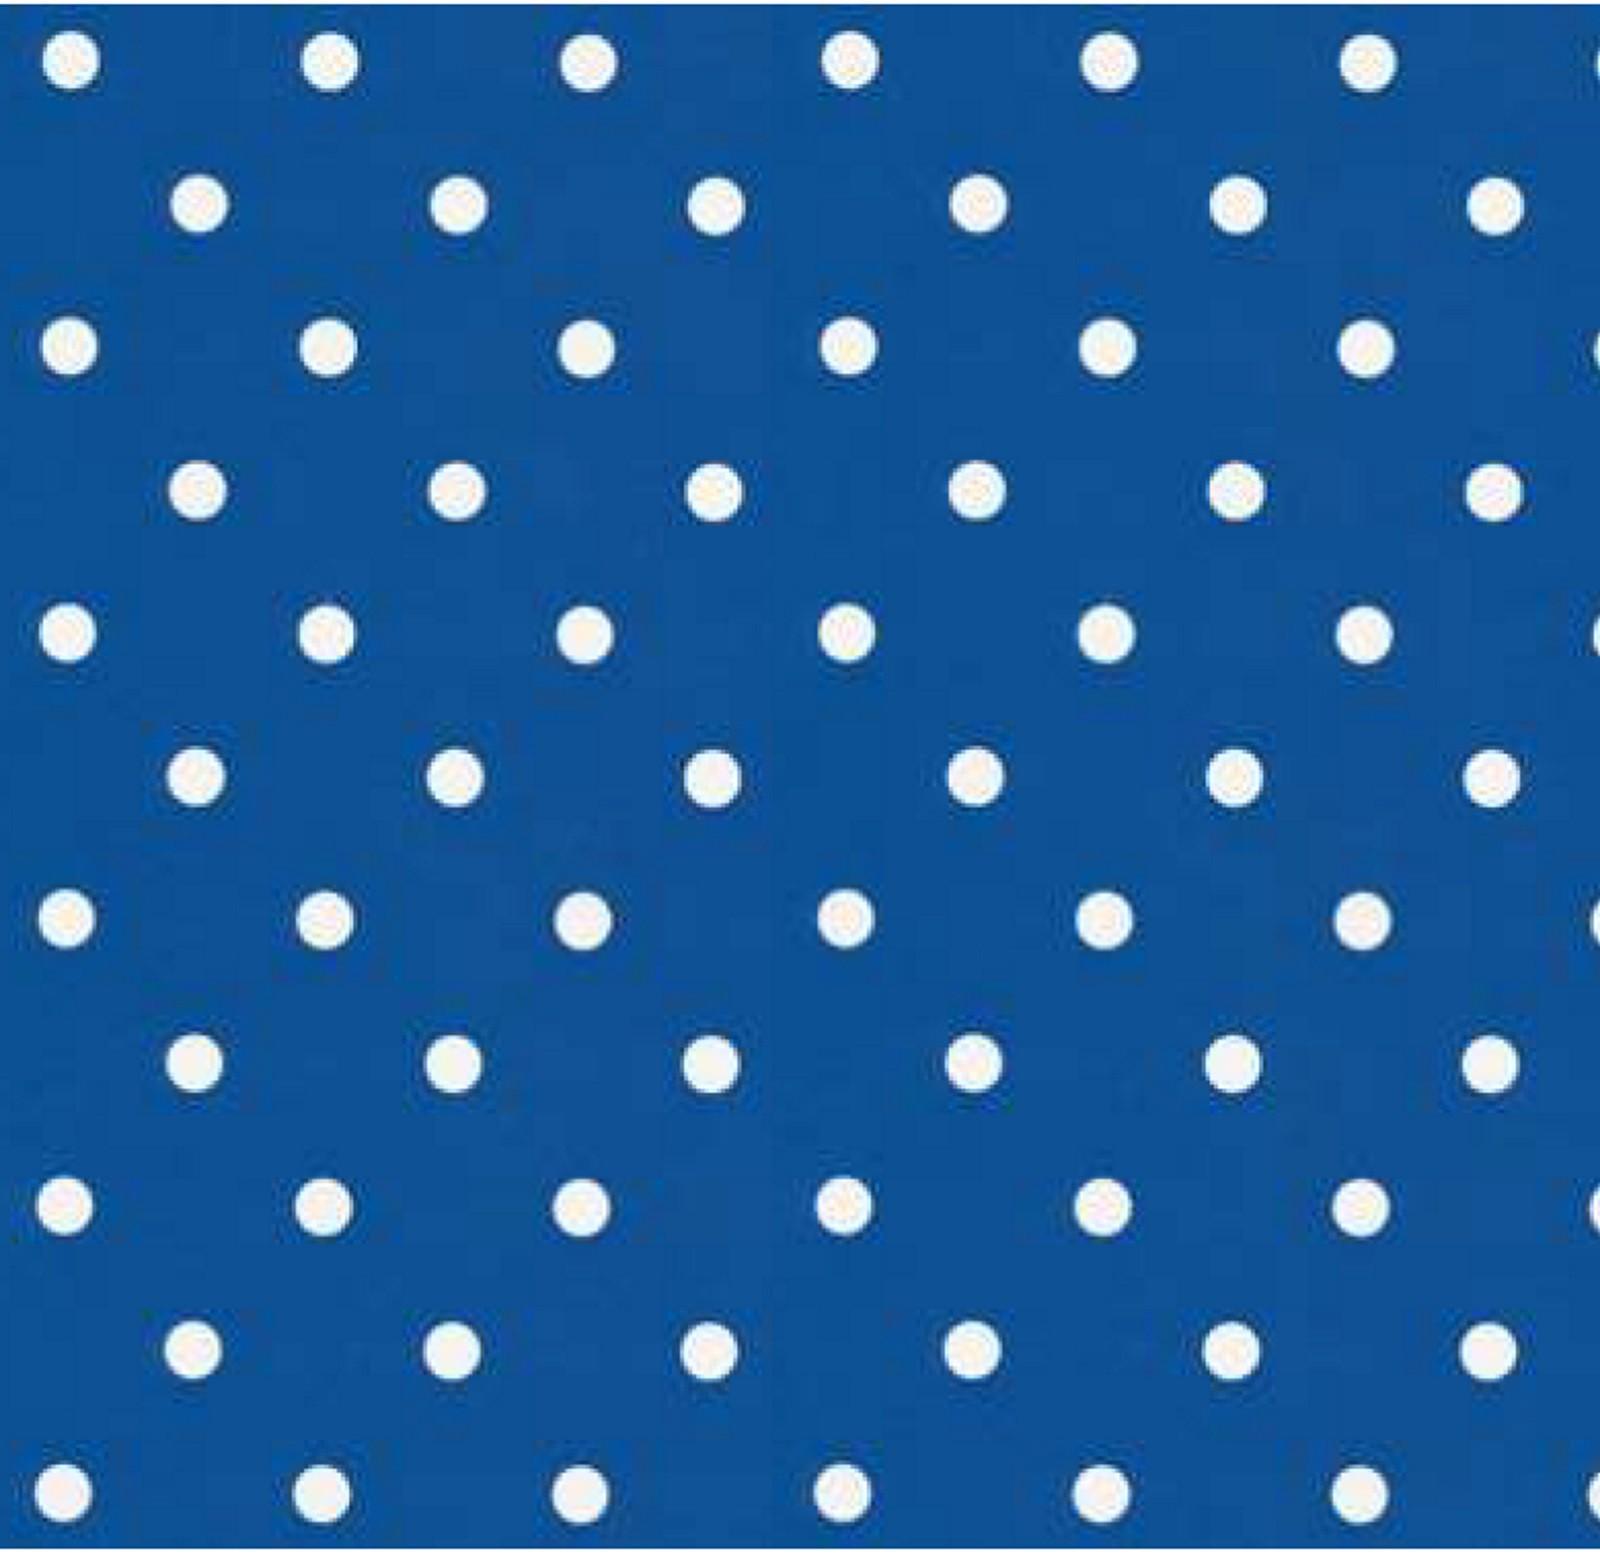 klebefolie möbelfolie dots punkte blau selbstklebende folie 45x200